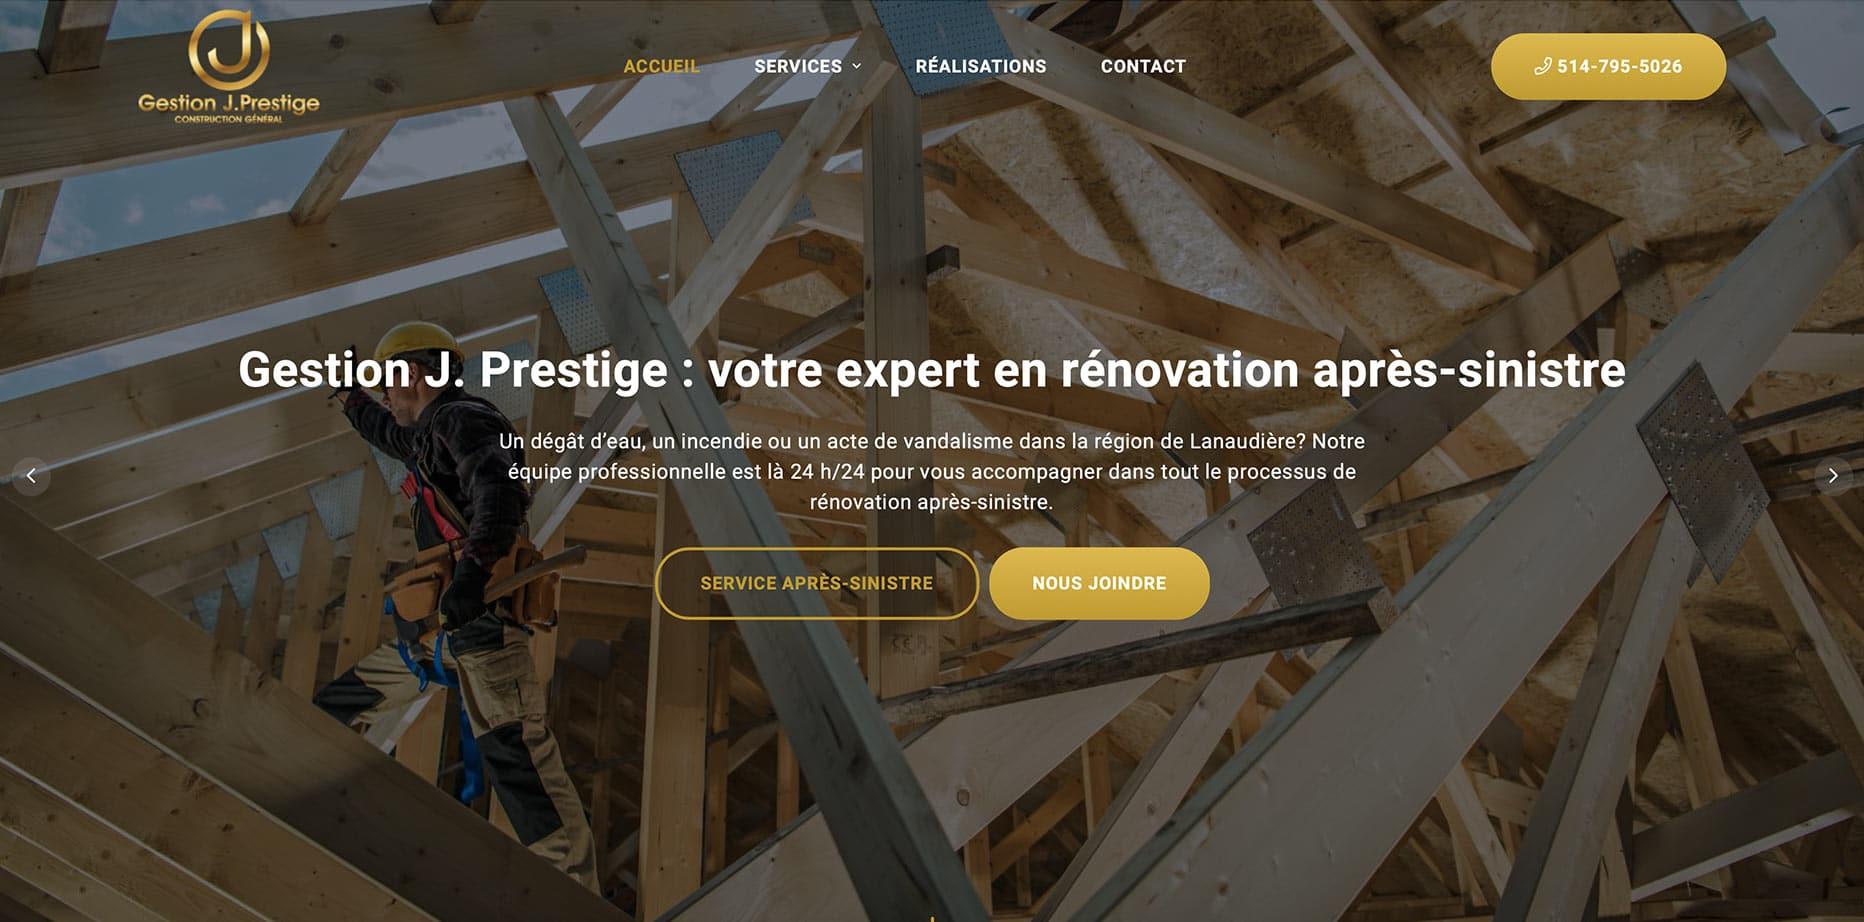 gestion-j-prestige-1